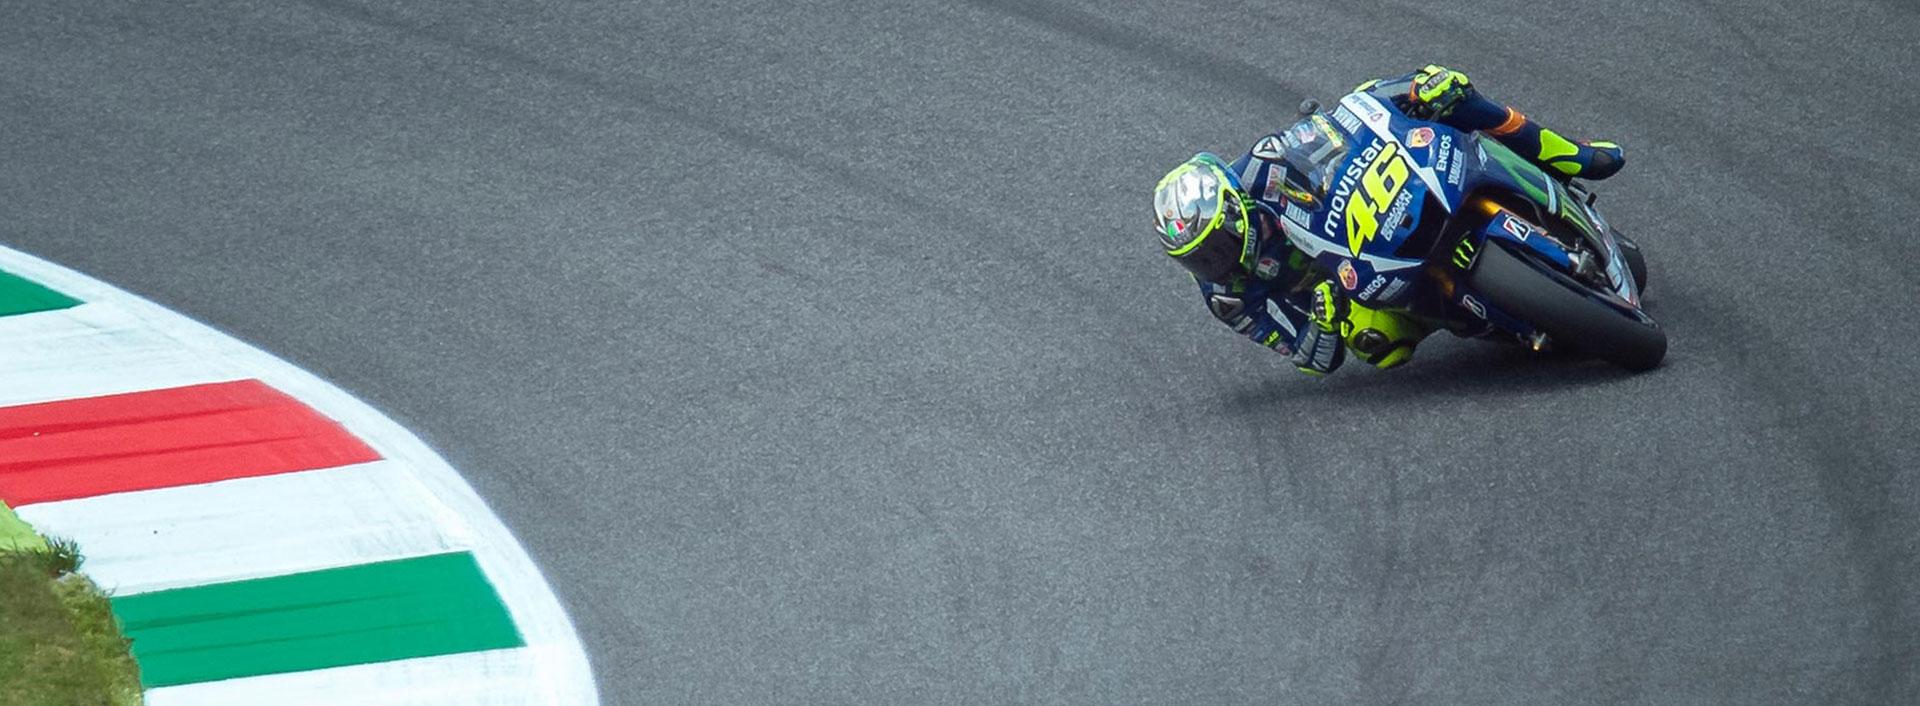 Slide Offerta MotoGP